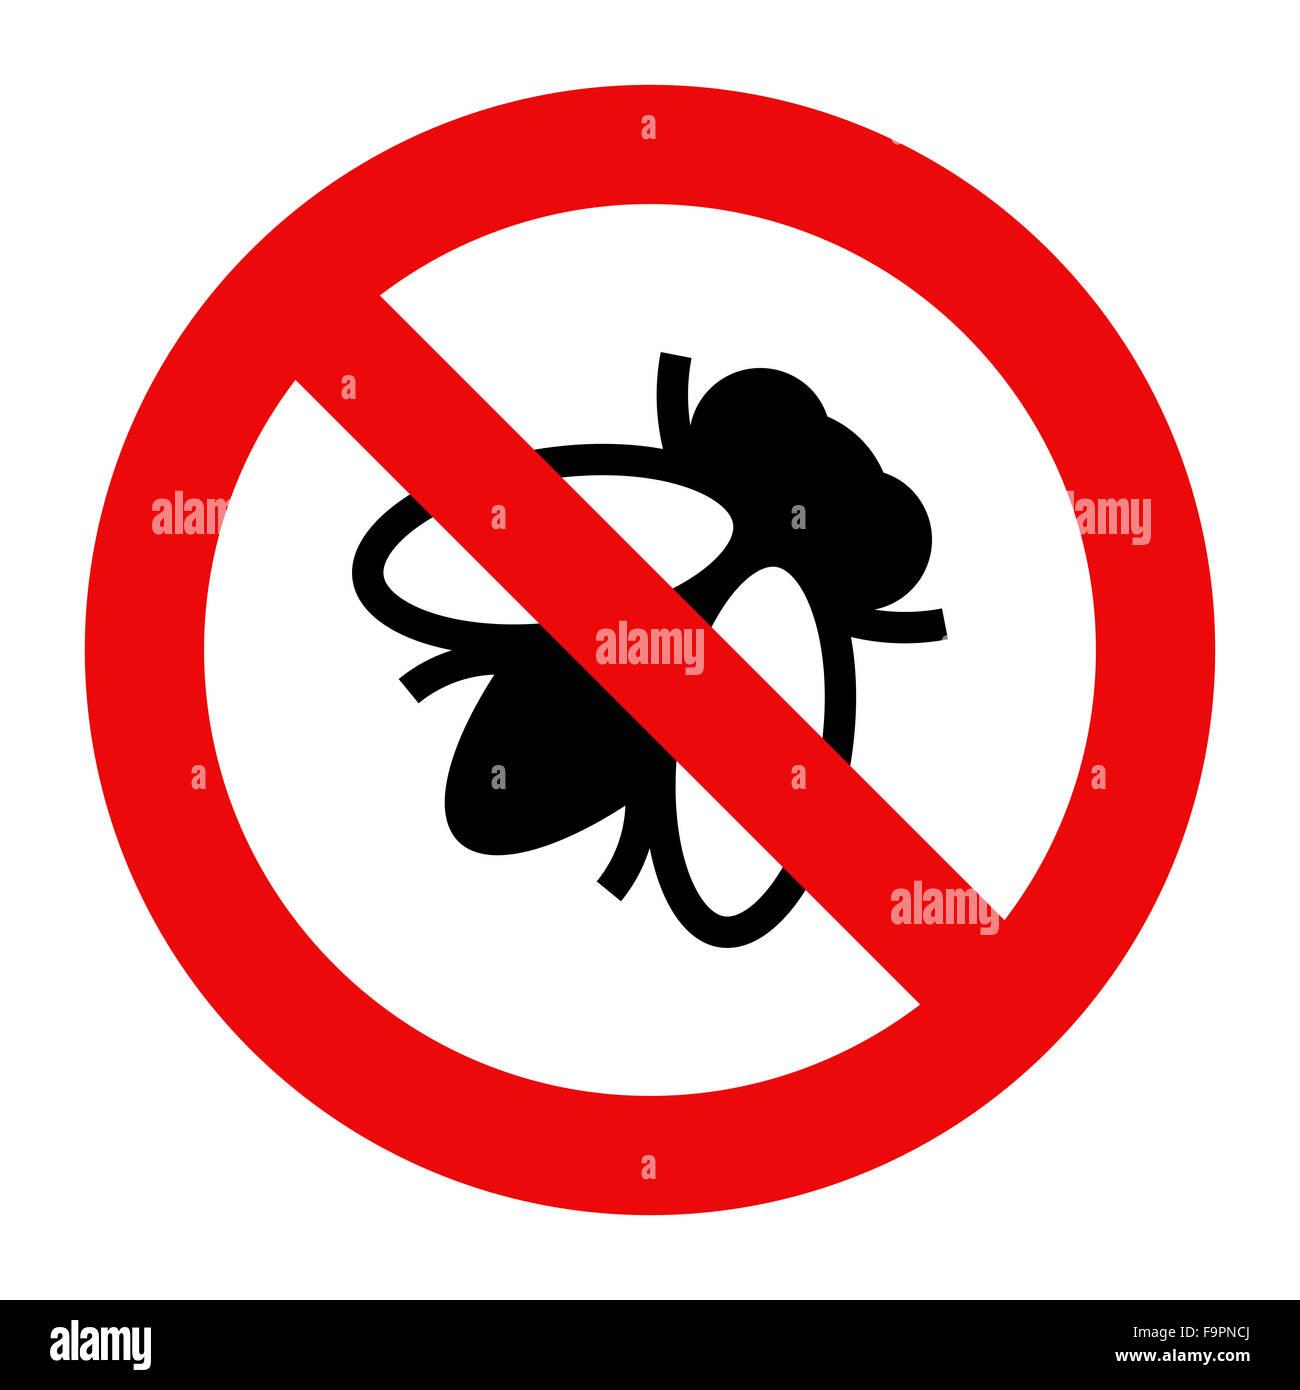 Fly warning sign isolated on white background - Stock Image